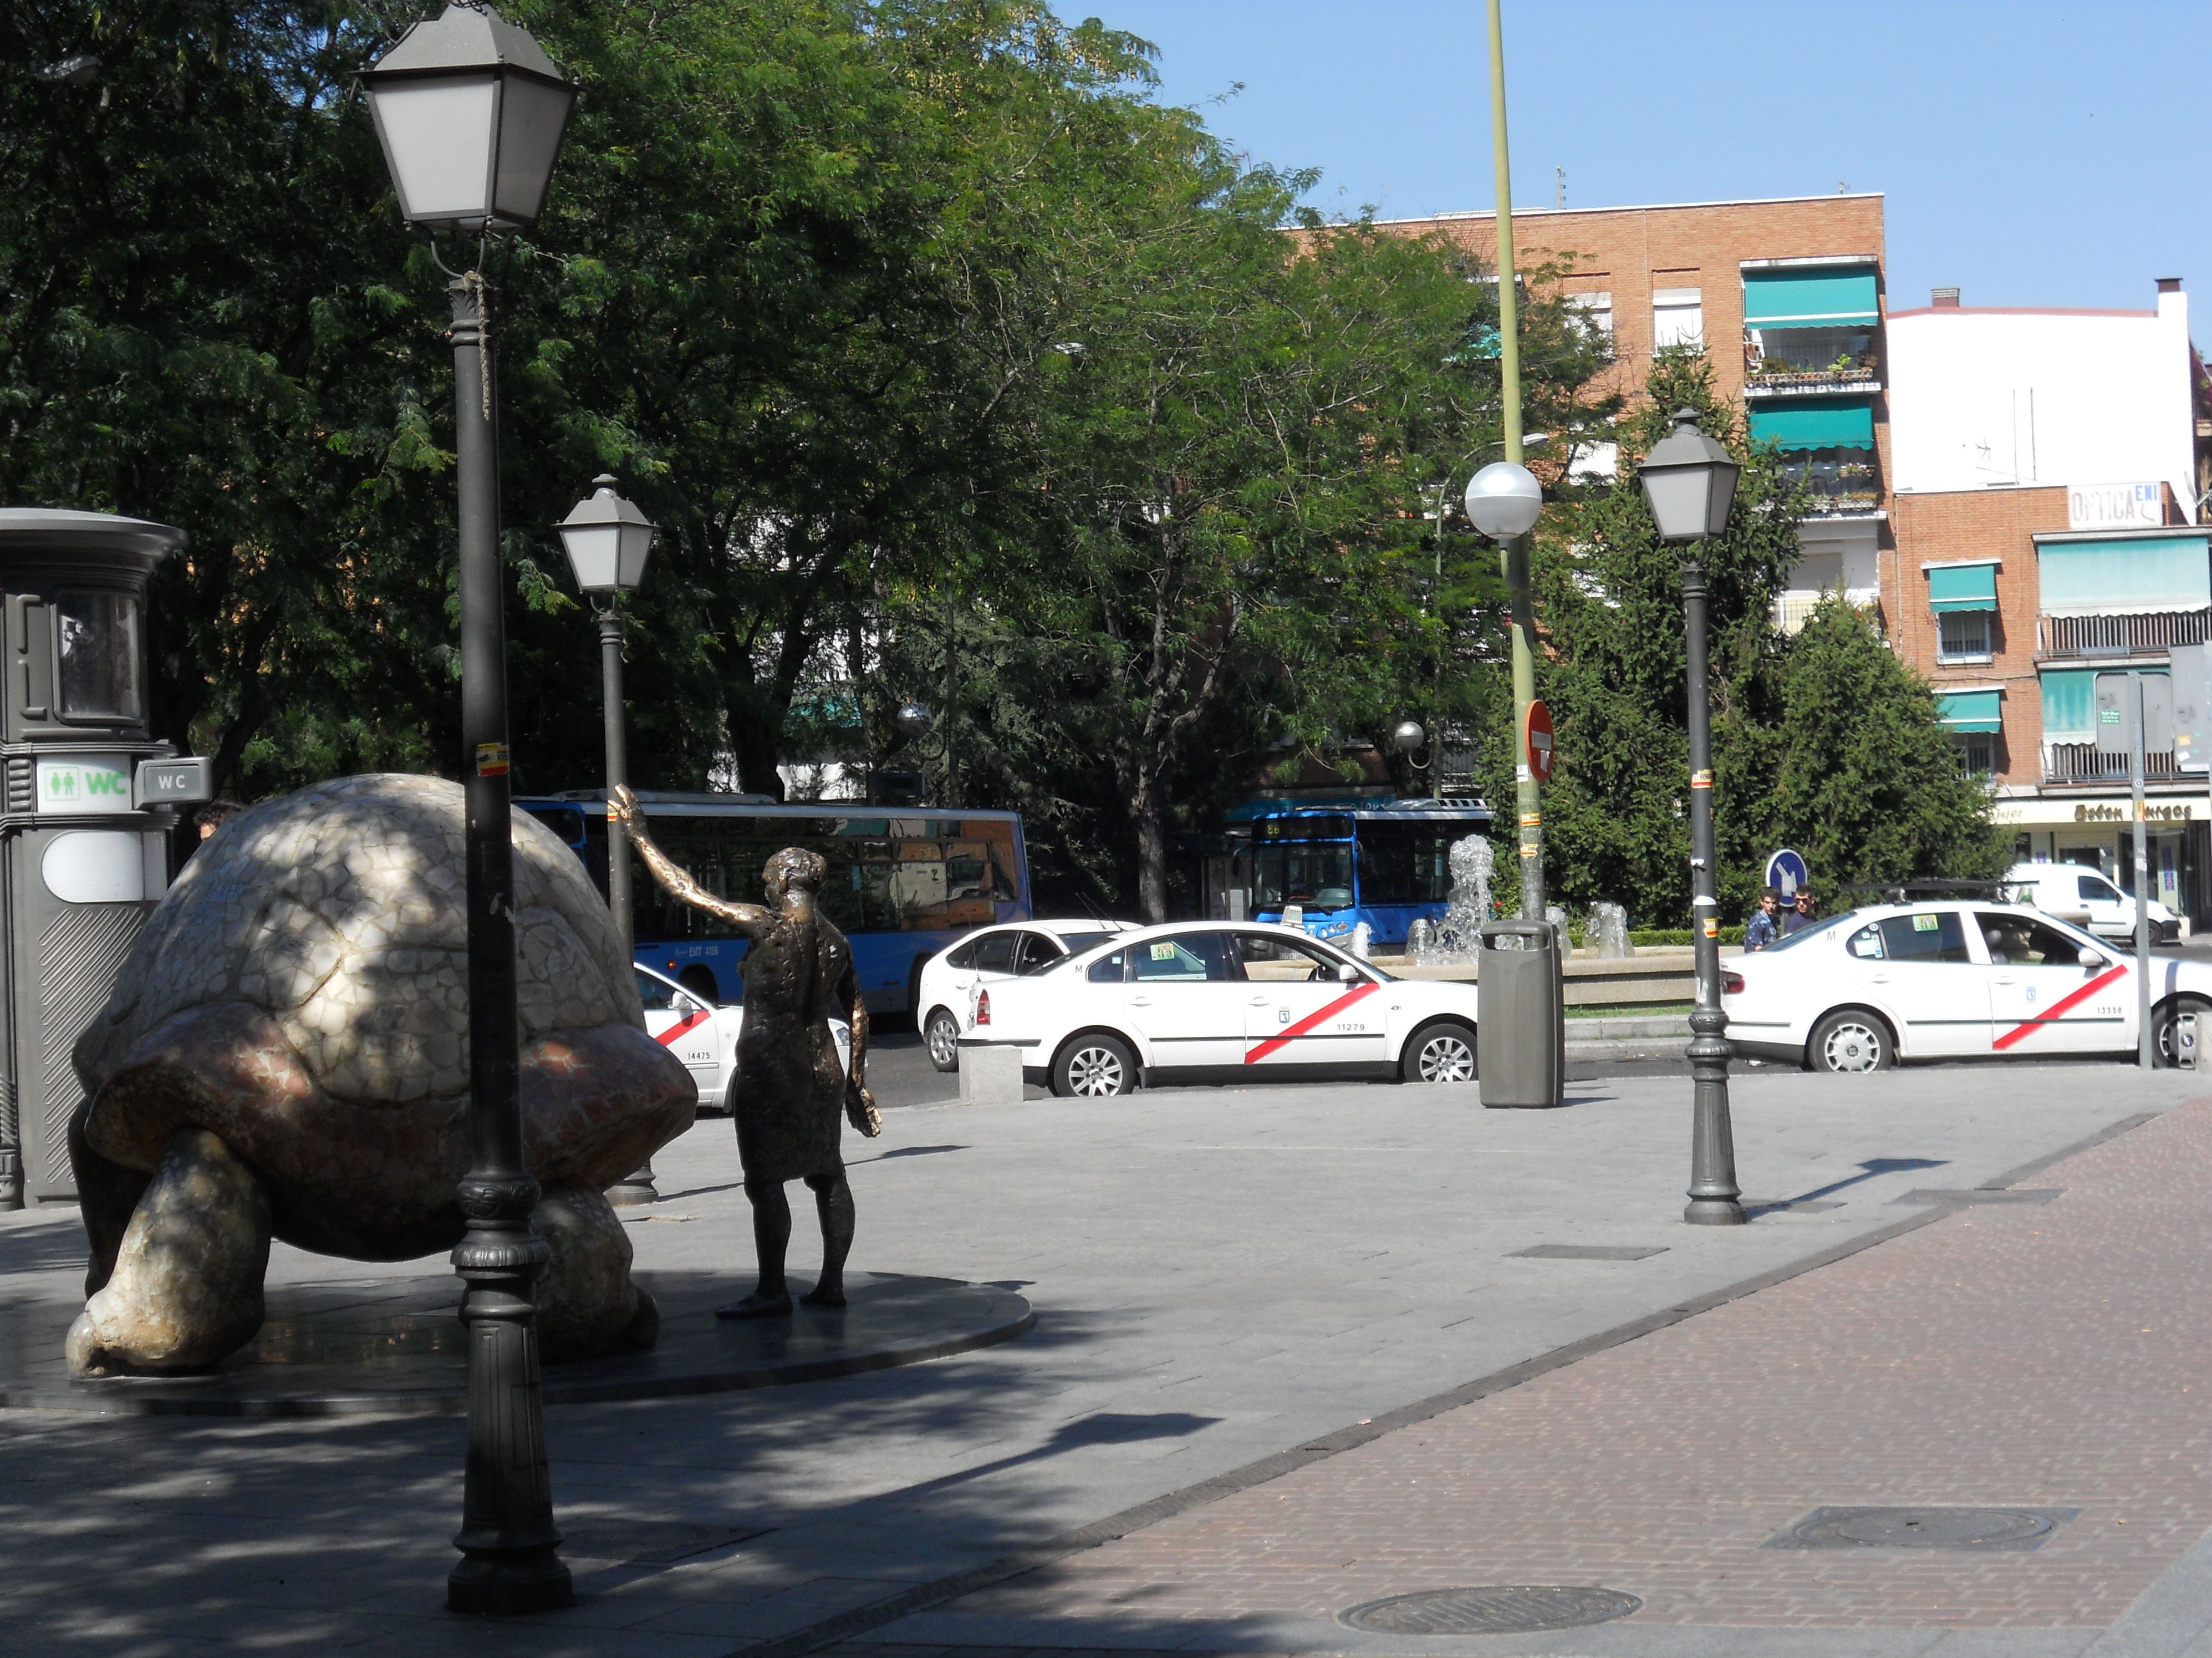 Plaza de la tortuga, San Andres, Villaverde Alto